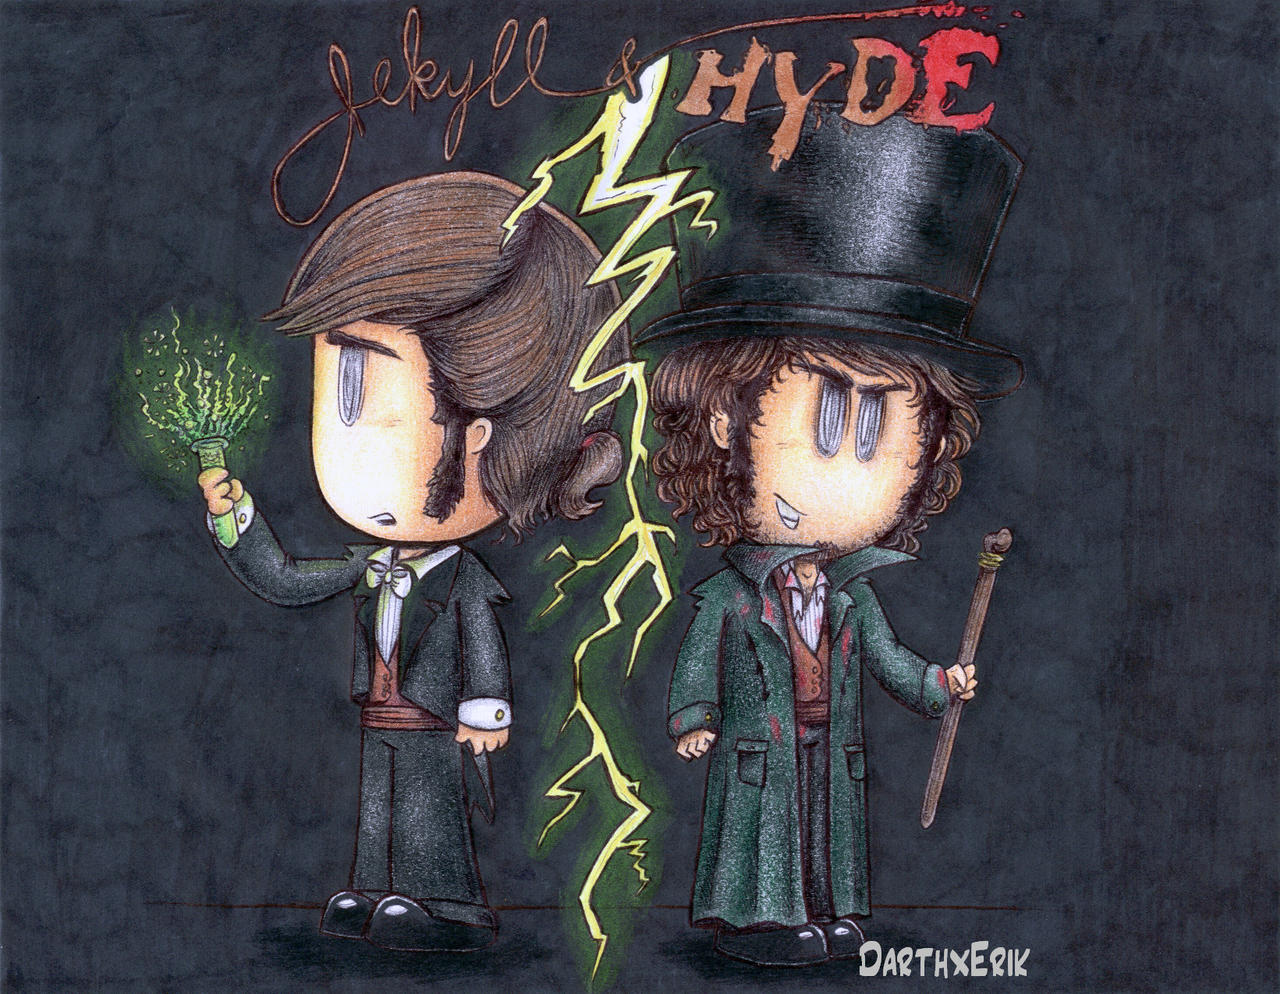 Jekyll amp Hyde musical  Wikipedia wolna encyklopedia